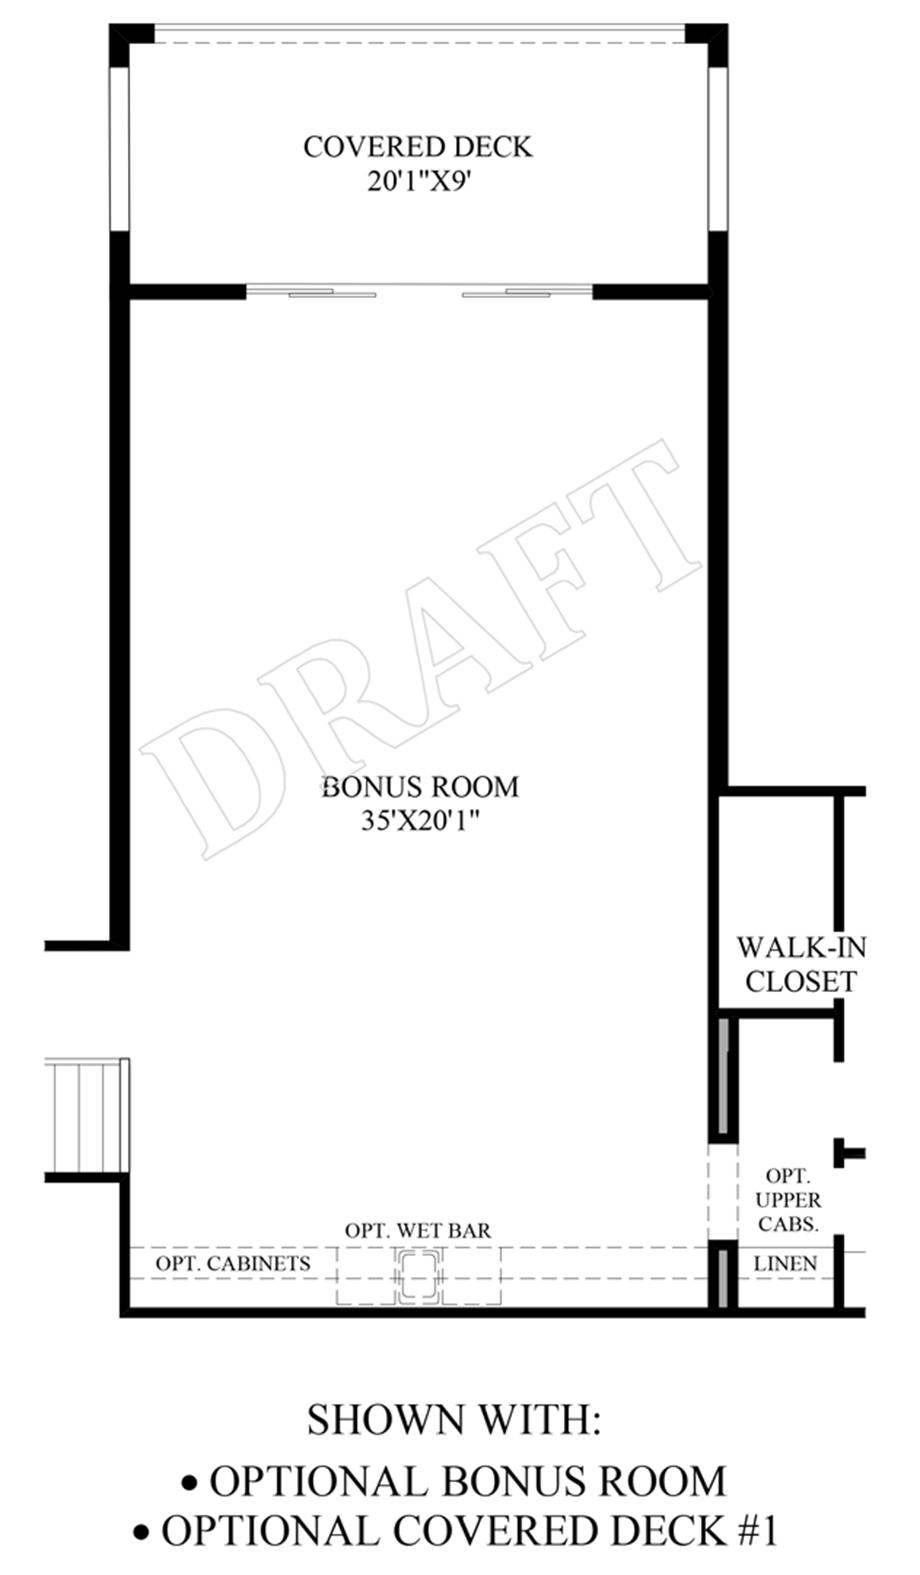 Optional Bonus Room & Covered Deck Floor Plan